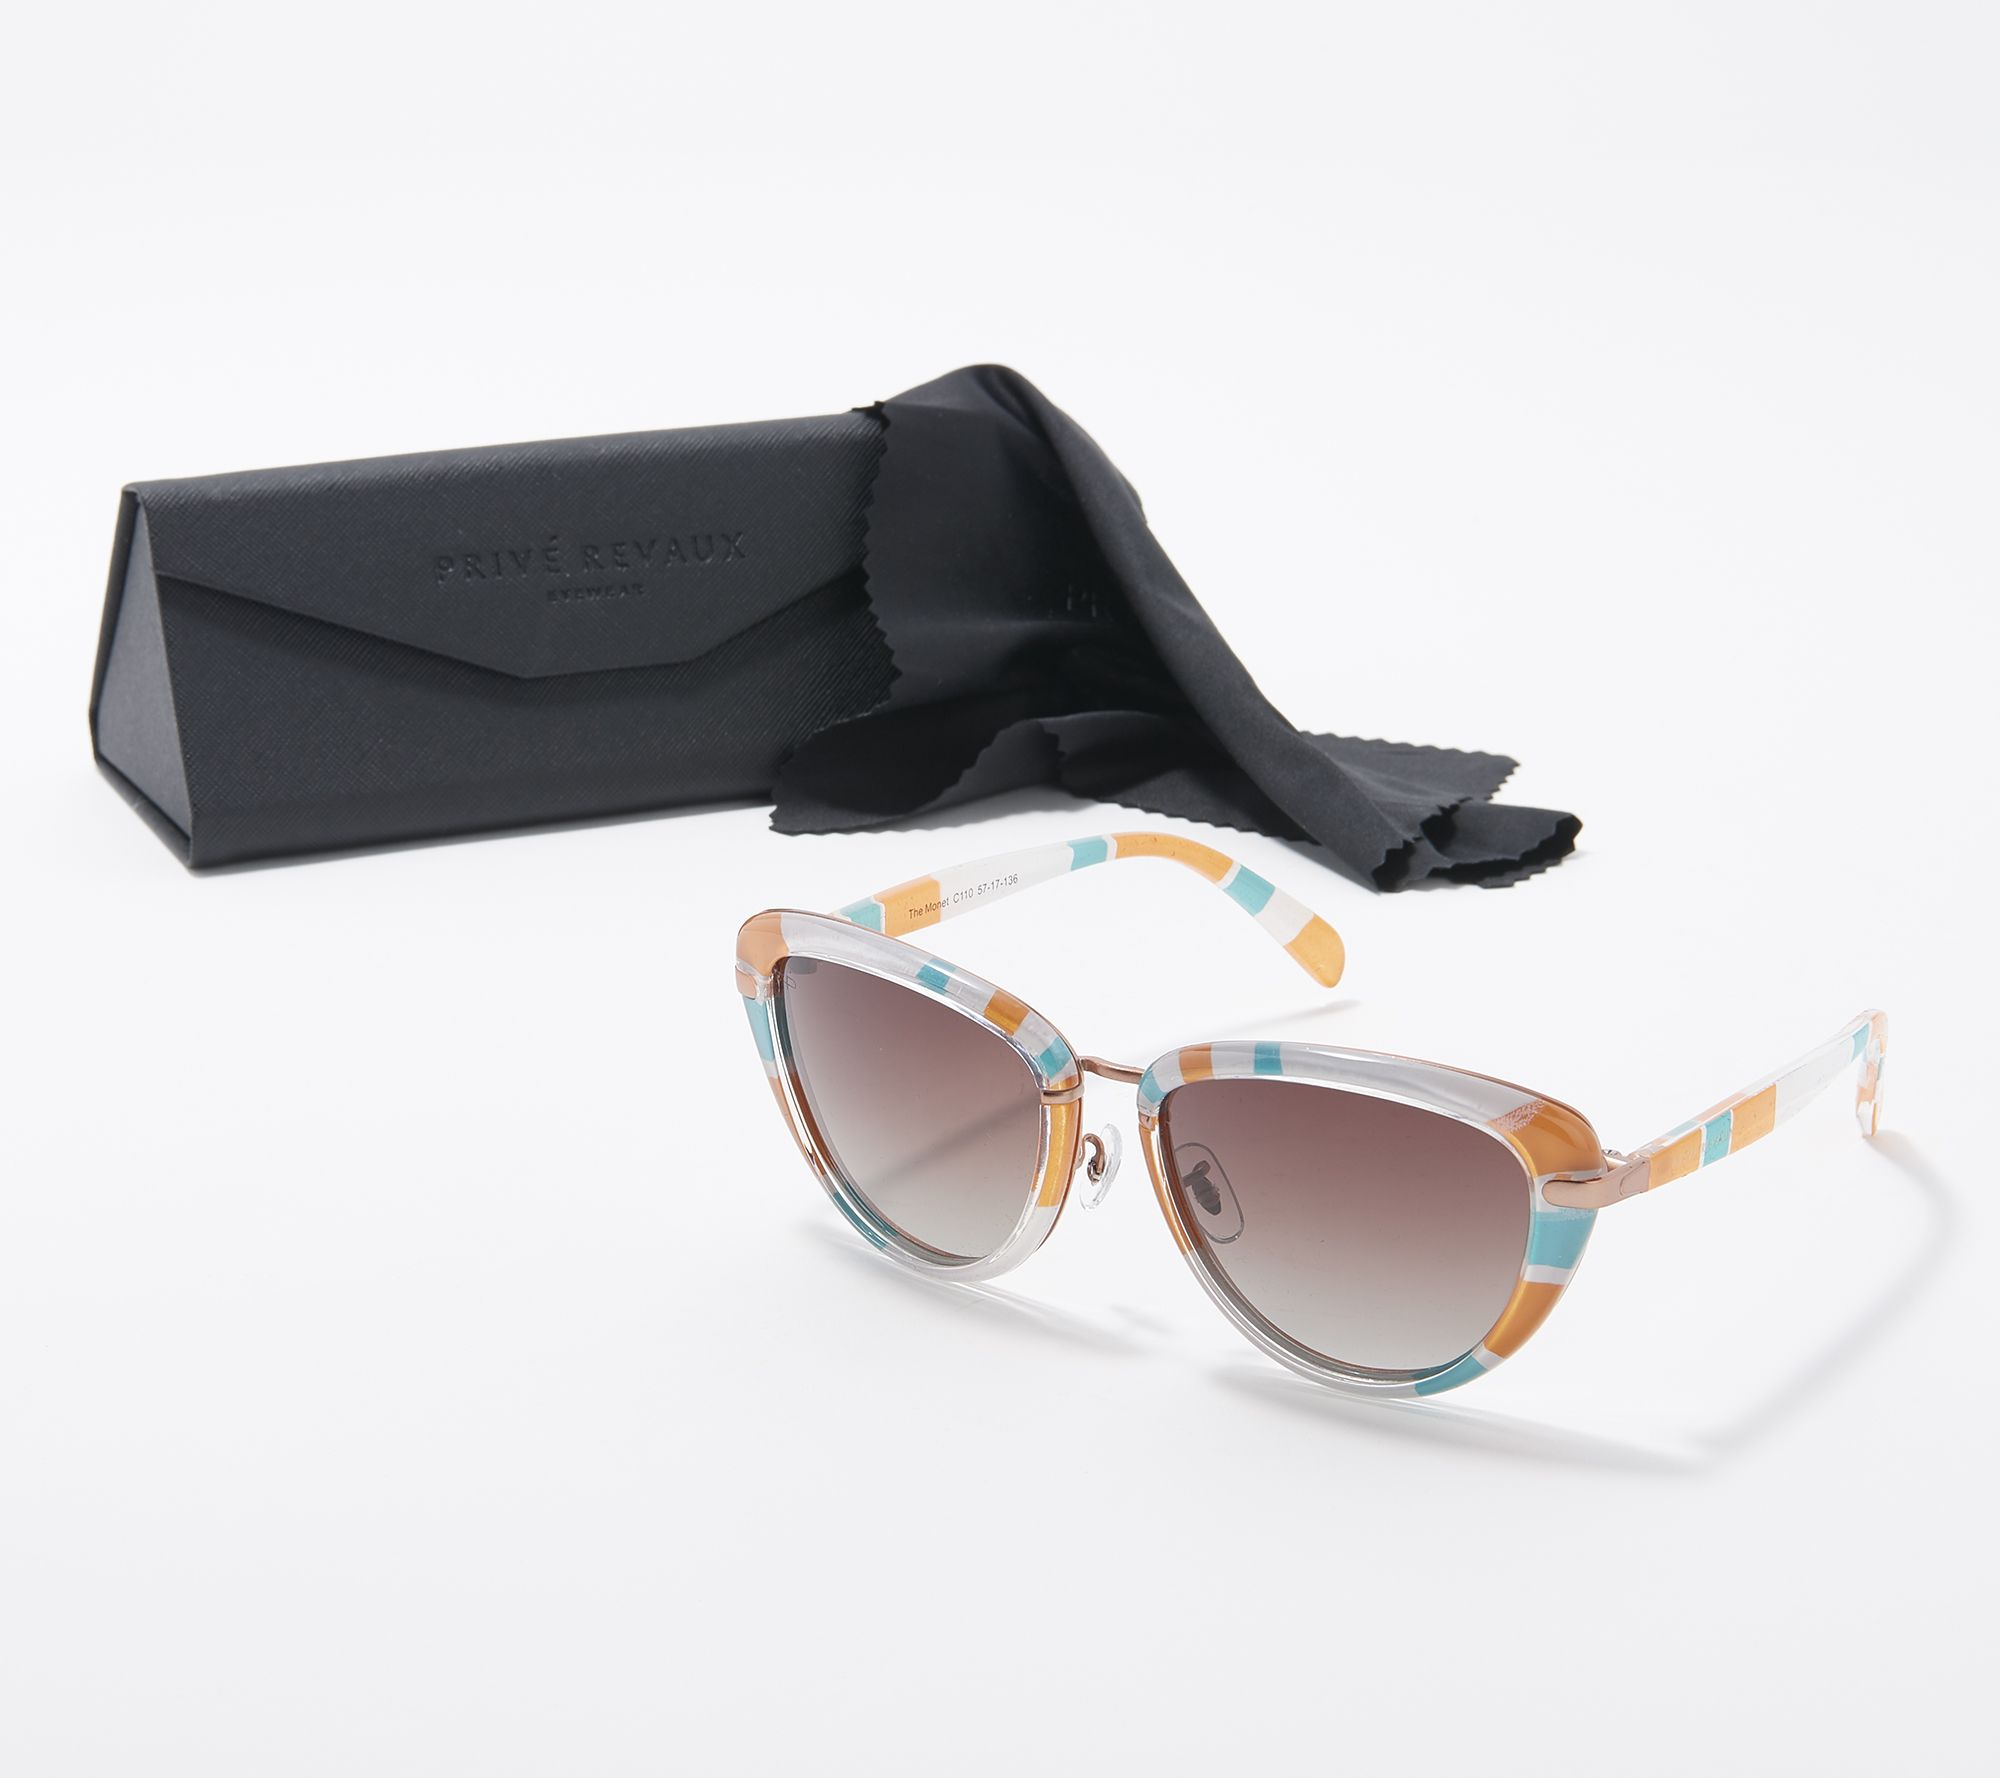 edf4d44589 Prive Revaux The Monet Polarized Cat-Eye Sunglasses - Page 1 — QVC.com